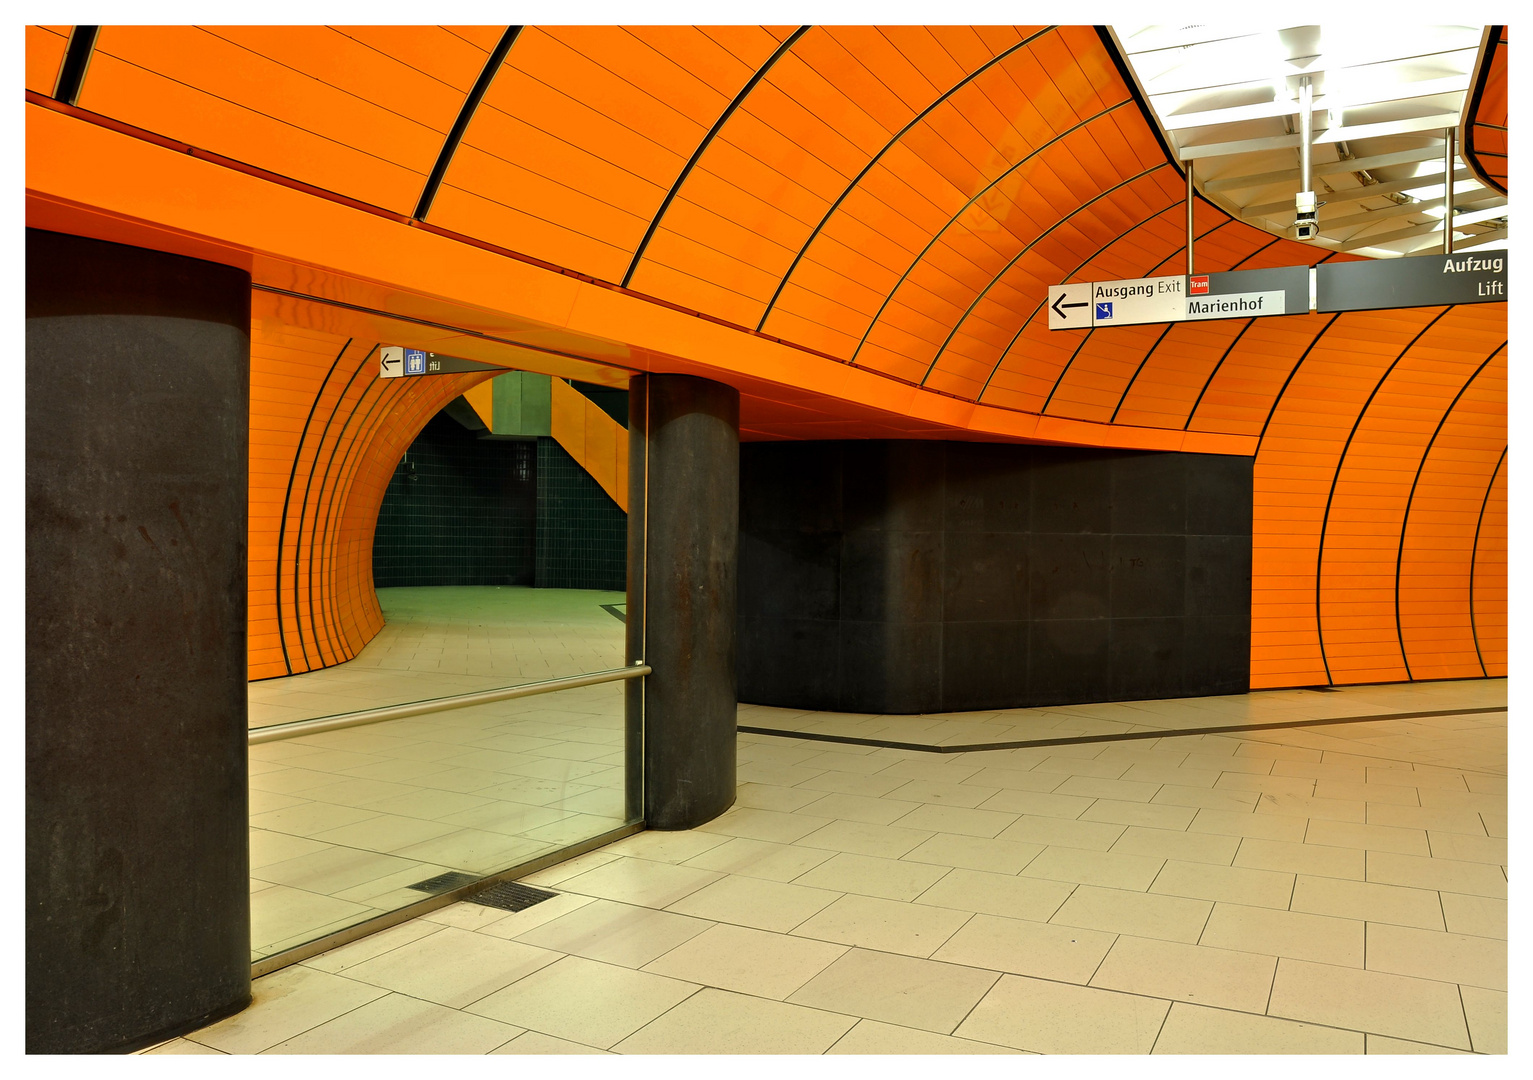 U-Bahn Station München Marienplatz II